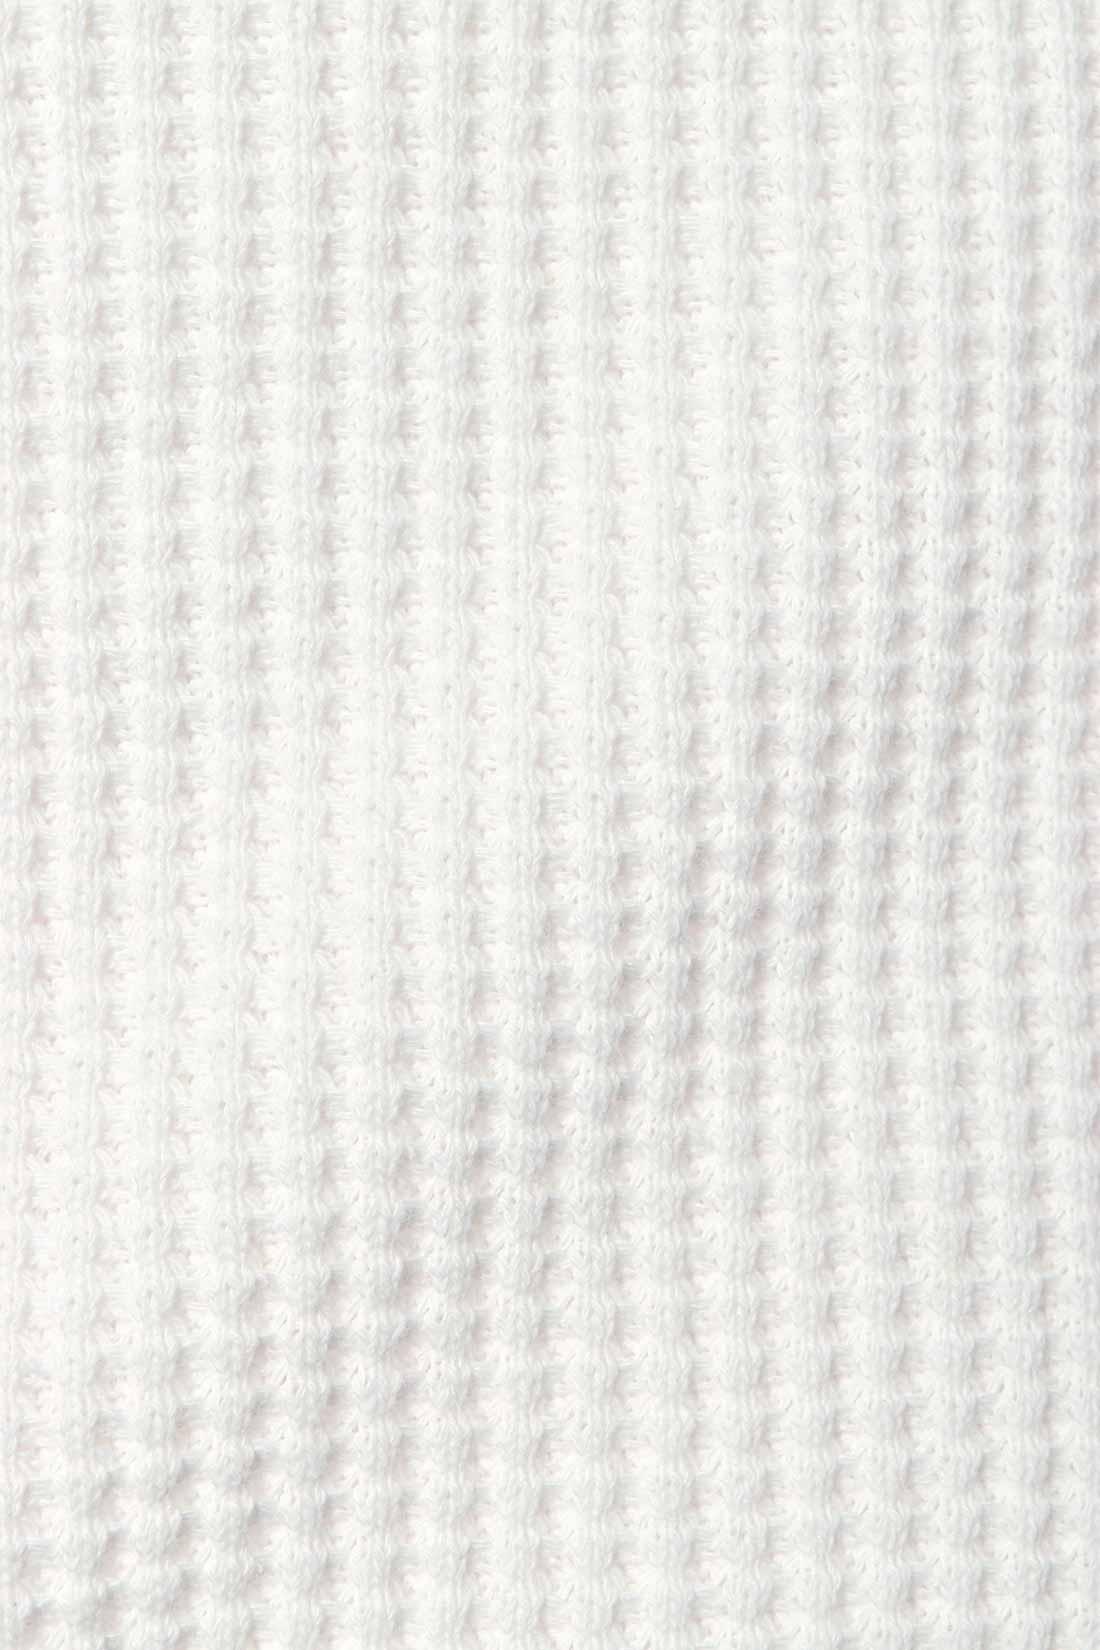 D6820D41BA9EF1E3175B1185B30C4165 - サイズが豊富!通販サイト「フェリシモ」は安くて可愛い商品がいっぱい!